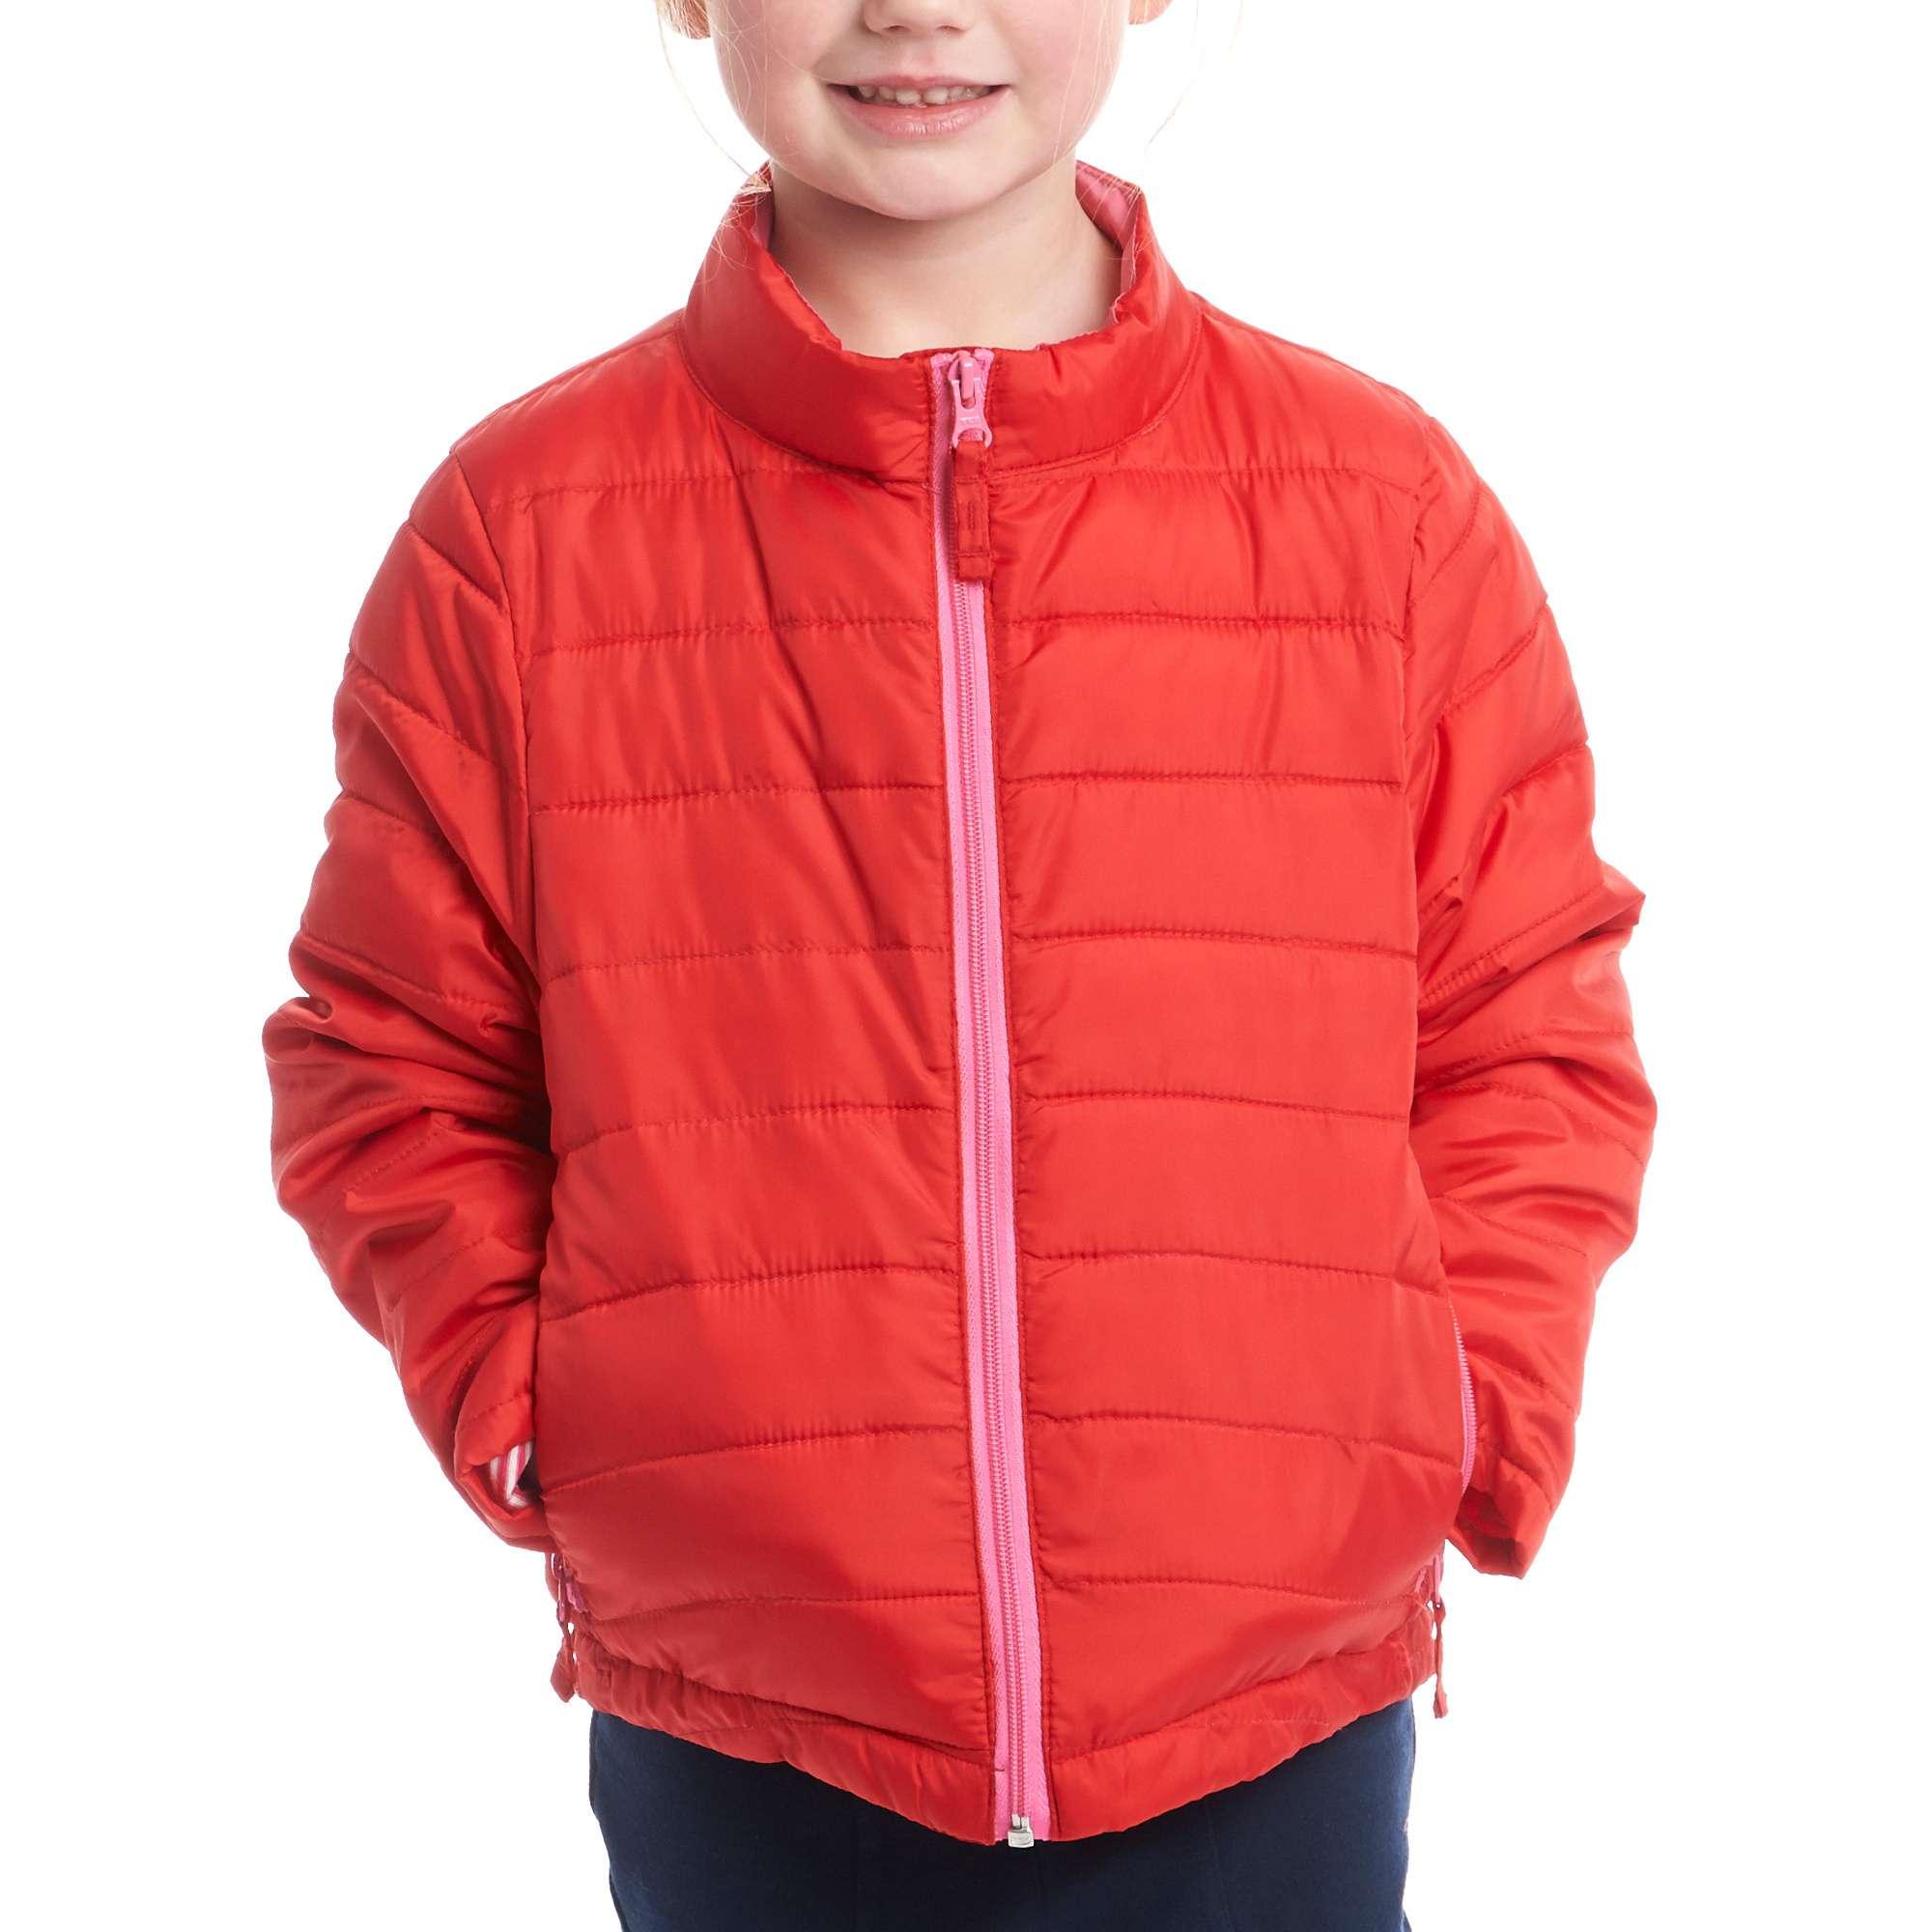 PETER STORM Girl's Insulated Packaway Jacket